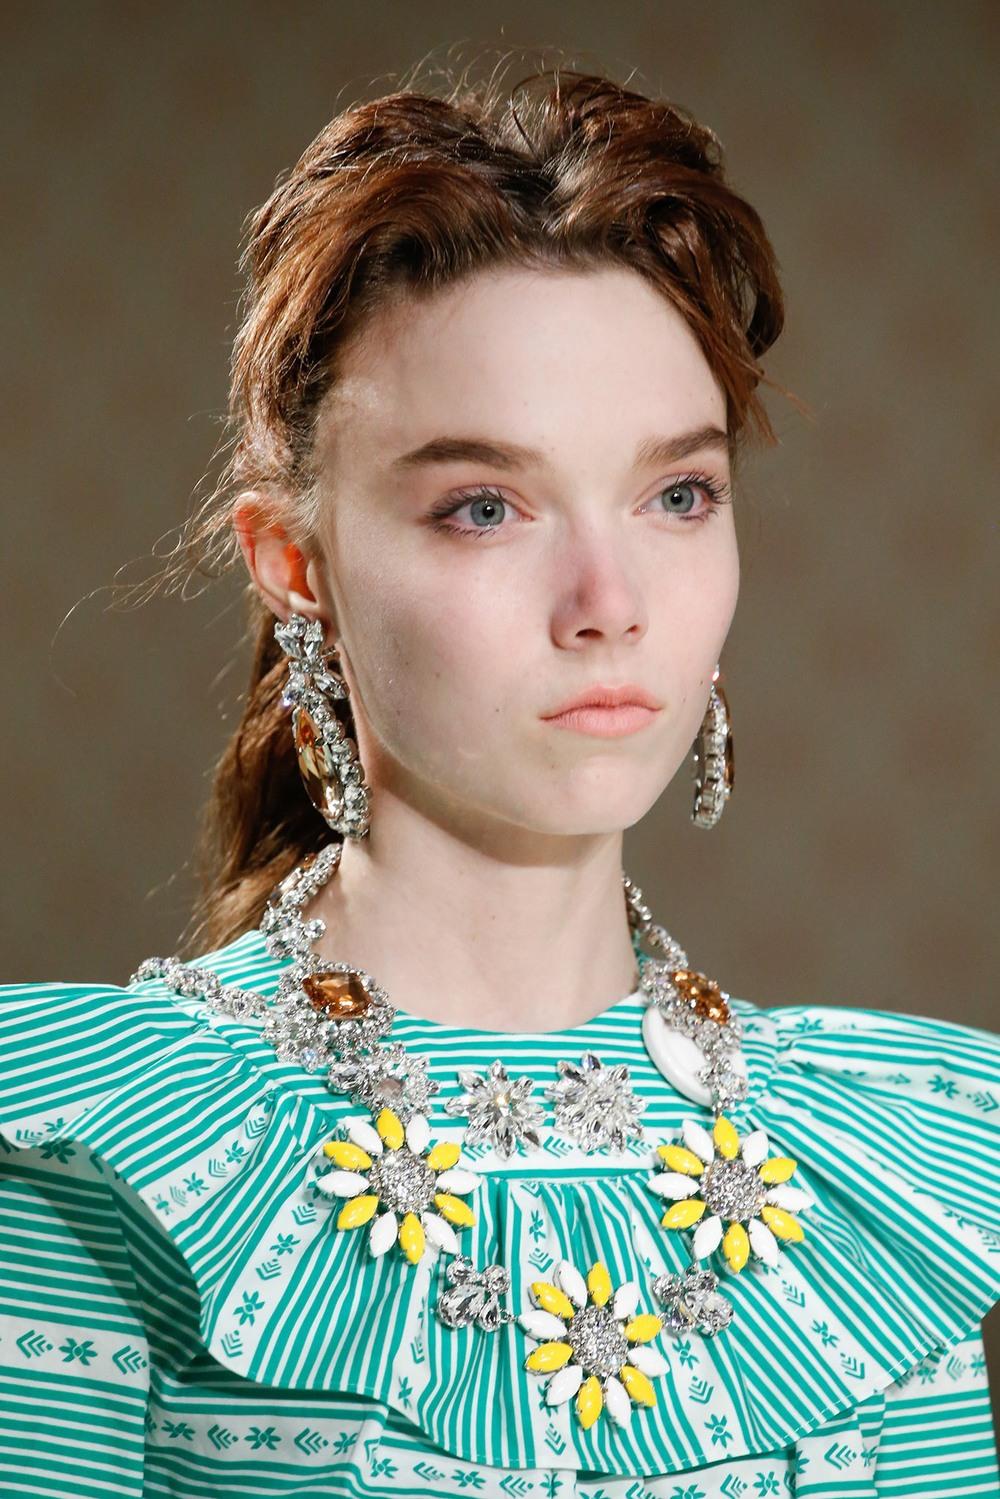 01-04-accessories-trends-fall-2015-estate-jewelry.jpg